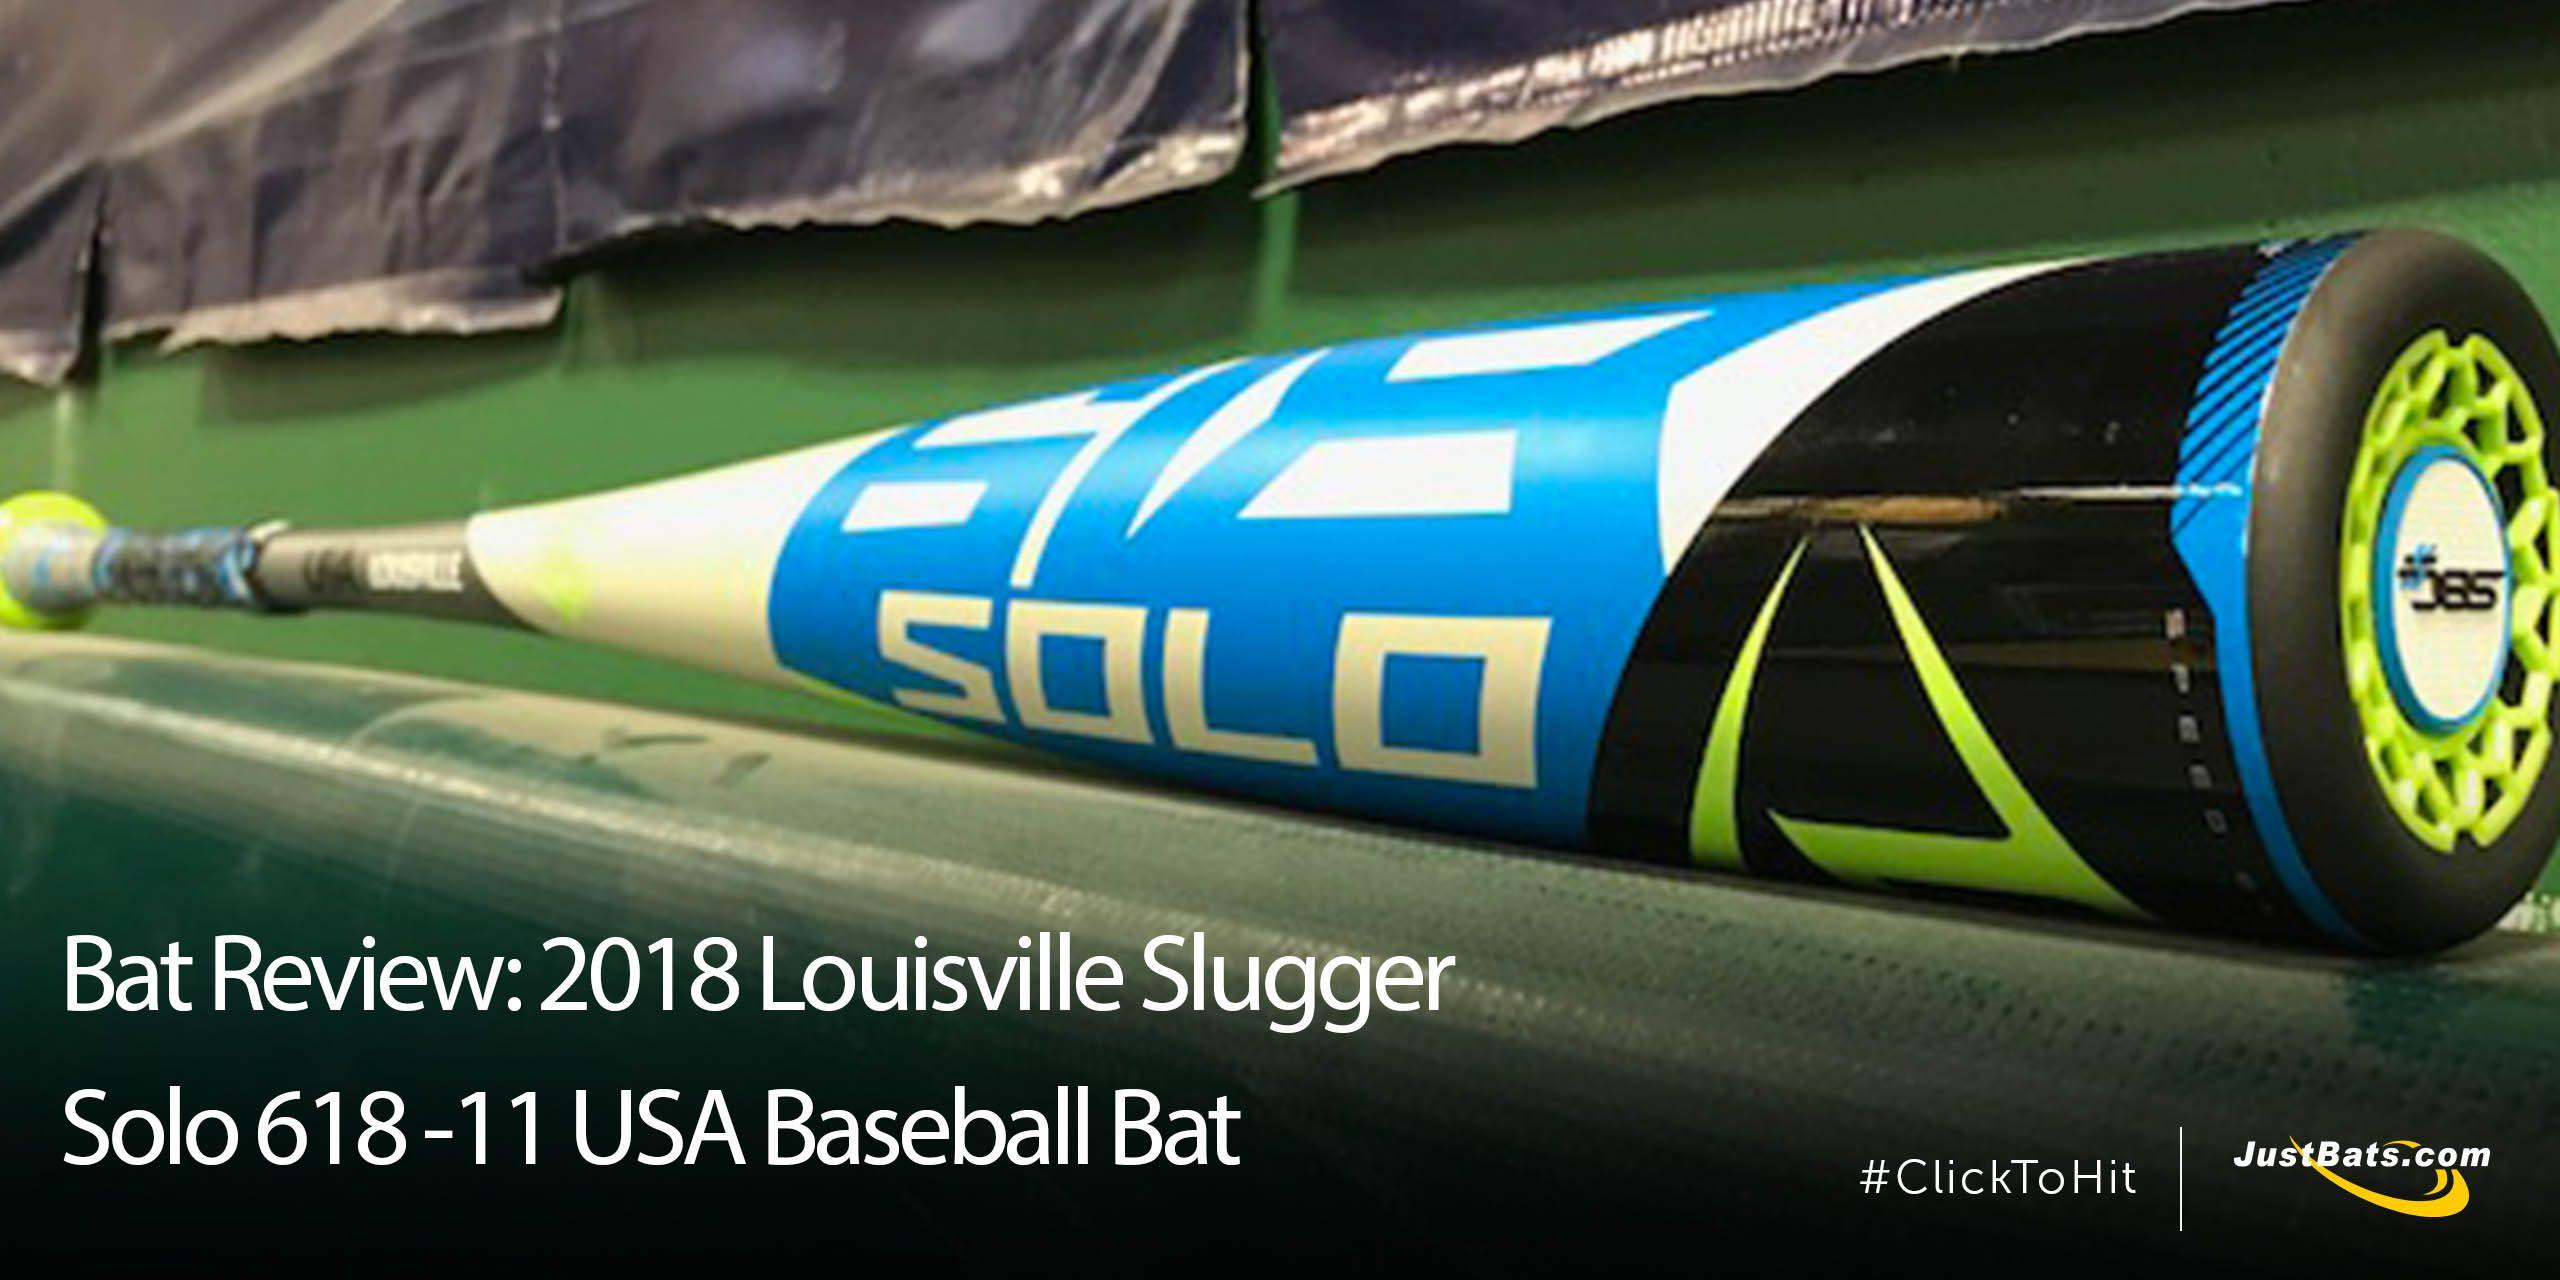 Bat Review: 2018 Louisville Slugger Solo 618 -11 USA Baseball Bat